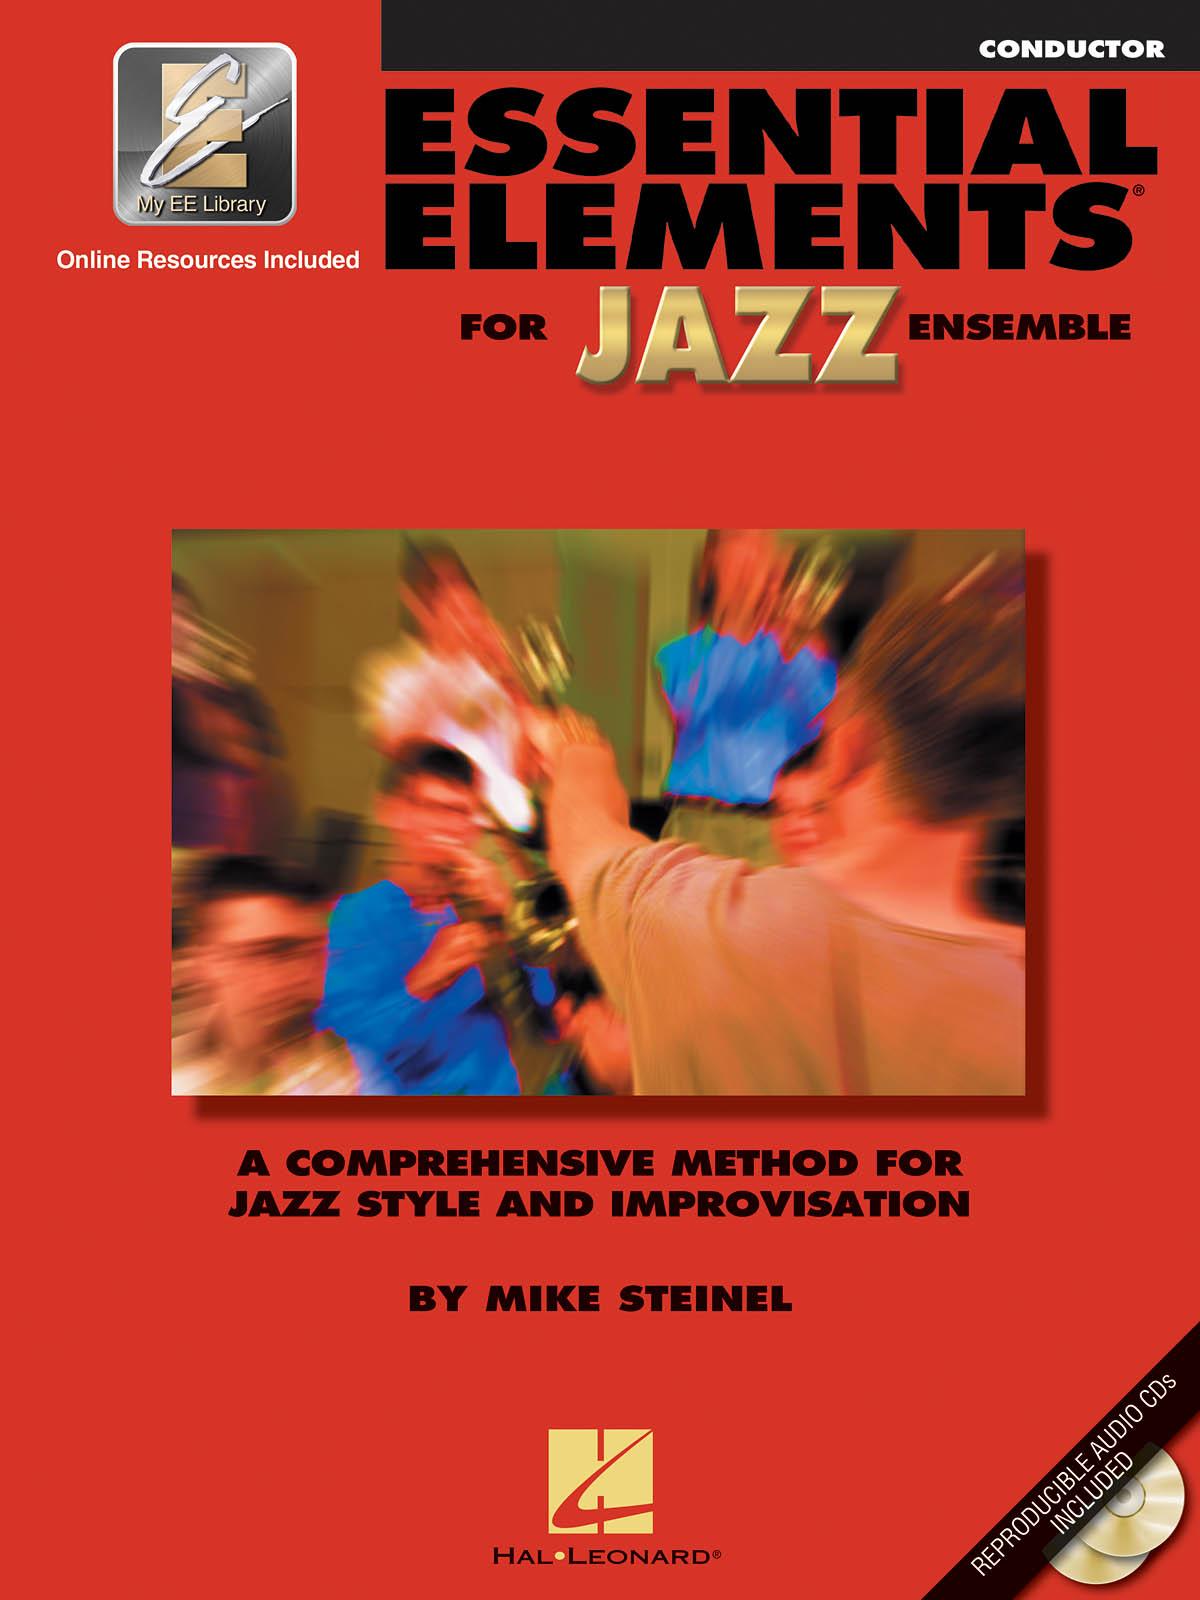 Essential Elements for Jazz Ensemble (Conductor): Jazz Ensemble: Book & Audio